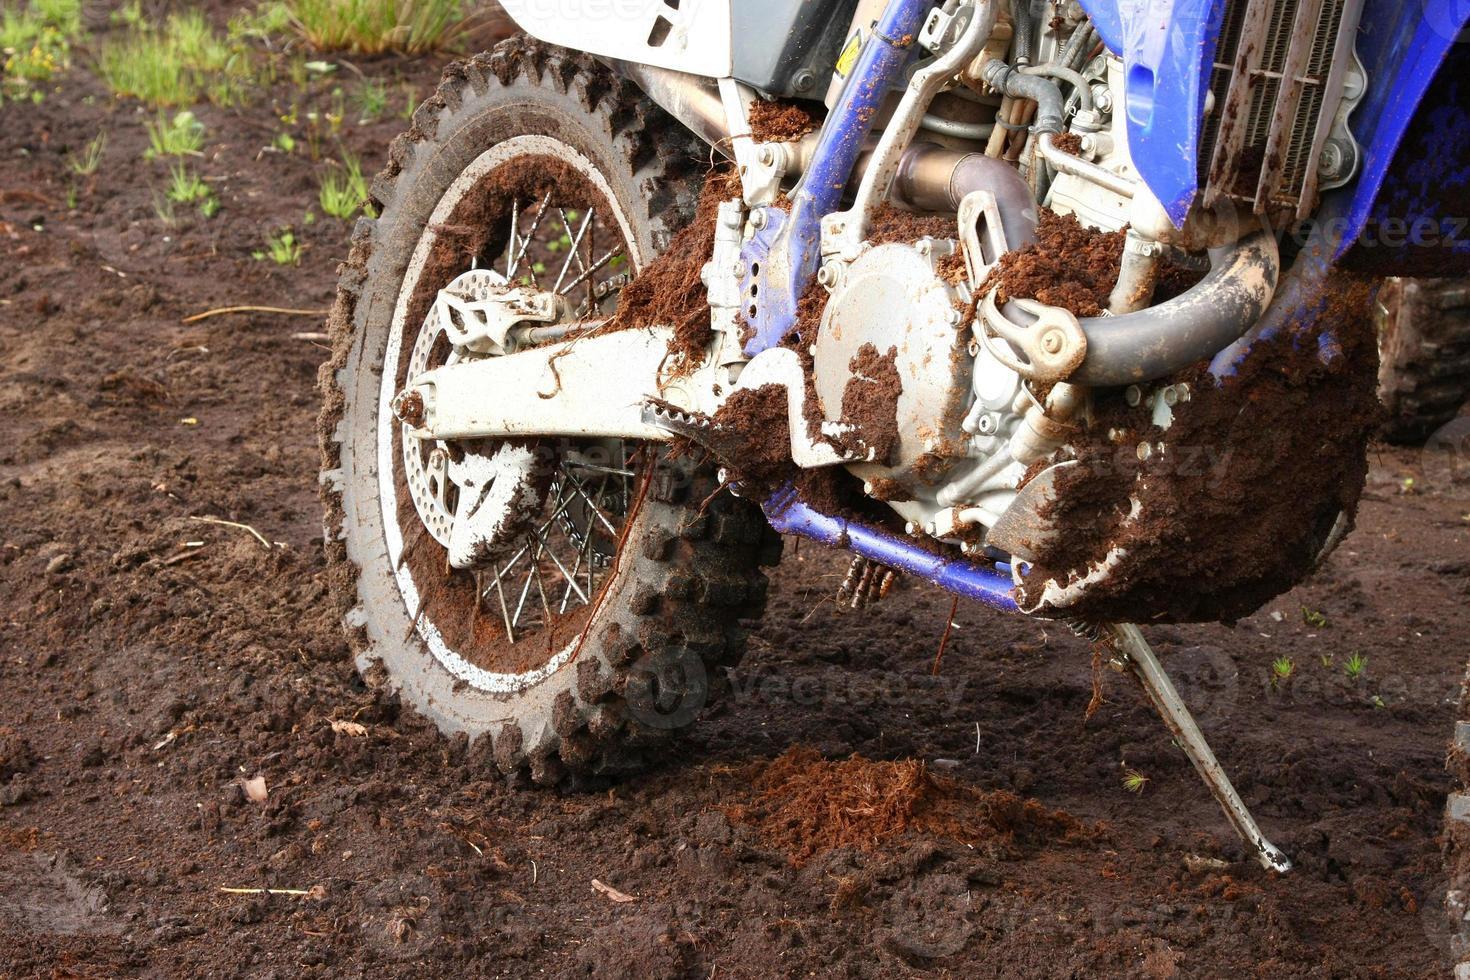 rueda trasera fangosa de moto de tierra foto